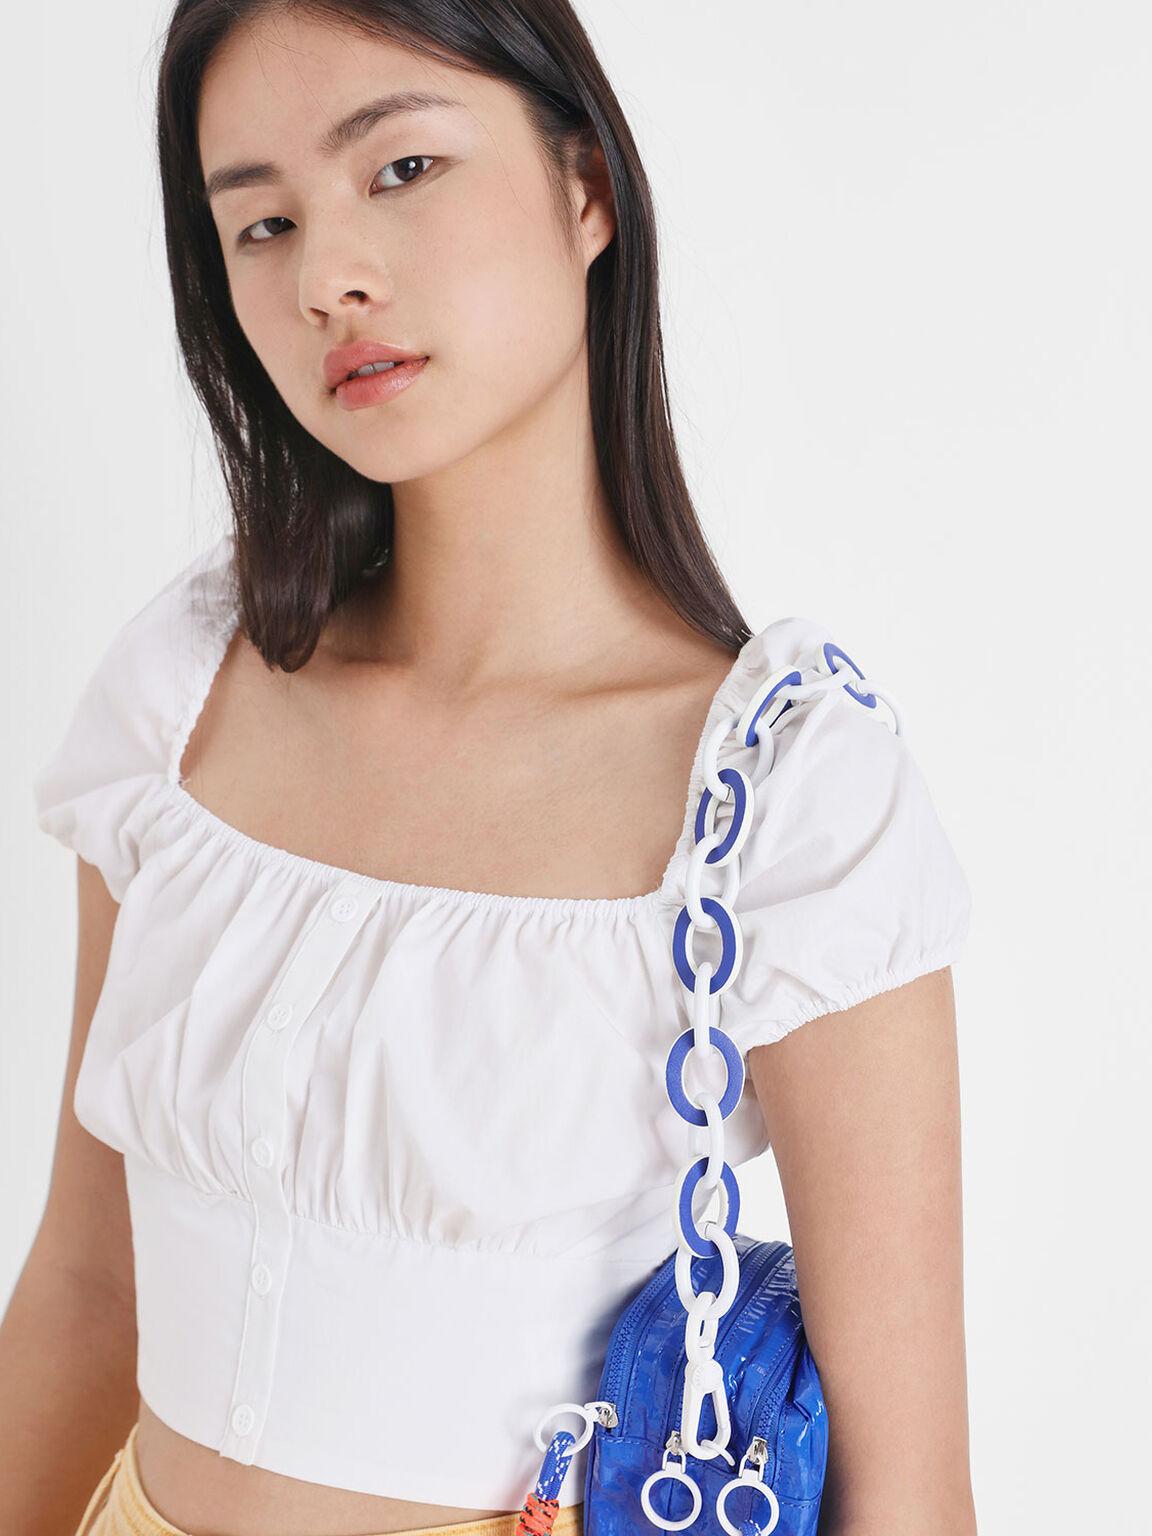 Two-Tone Chain Bag Strap, Blue, hi-res